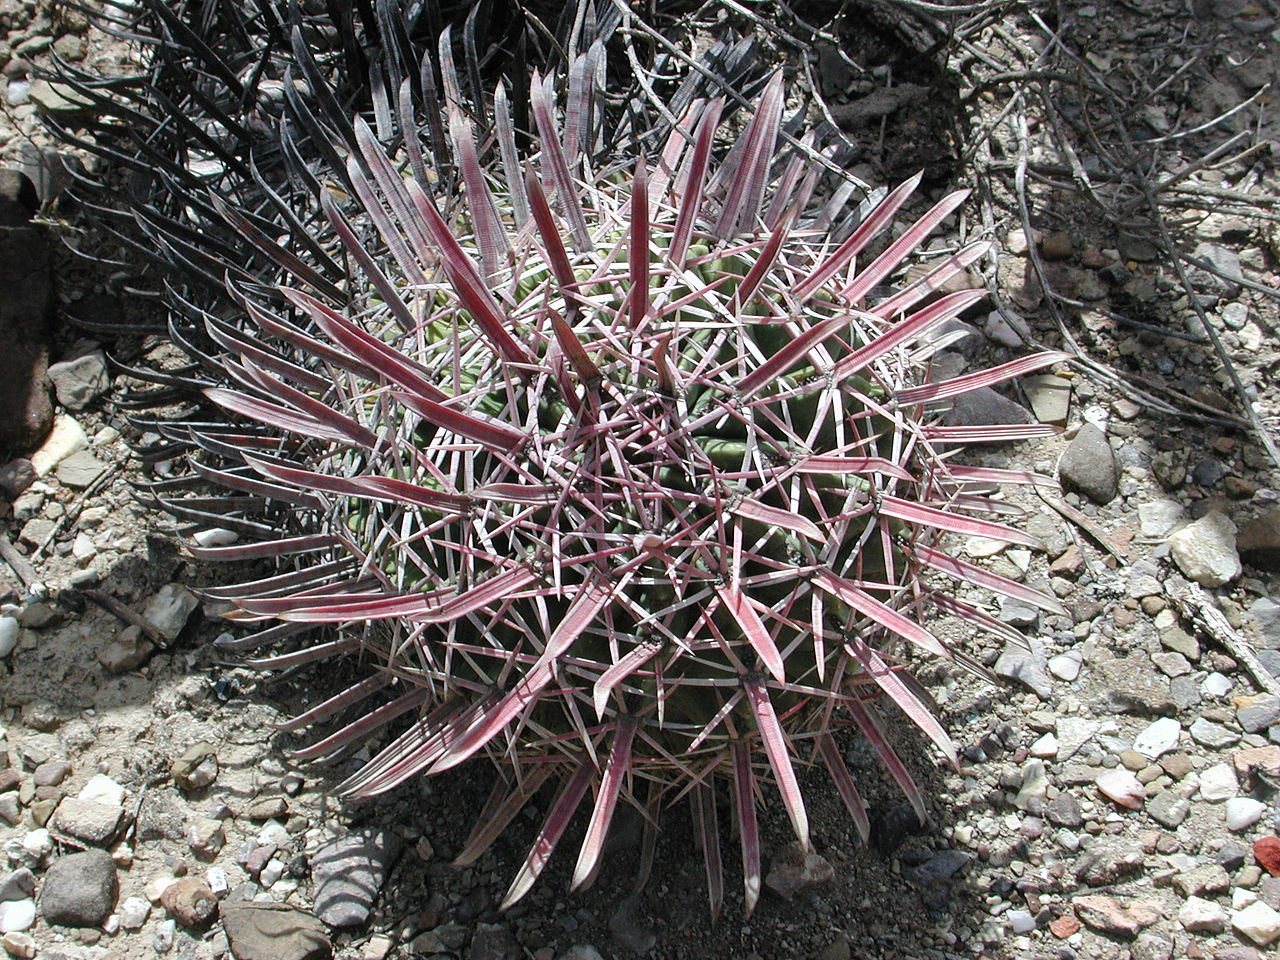 El Ferocactus latispinus es un cactus globular